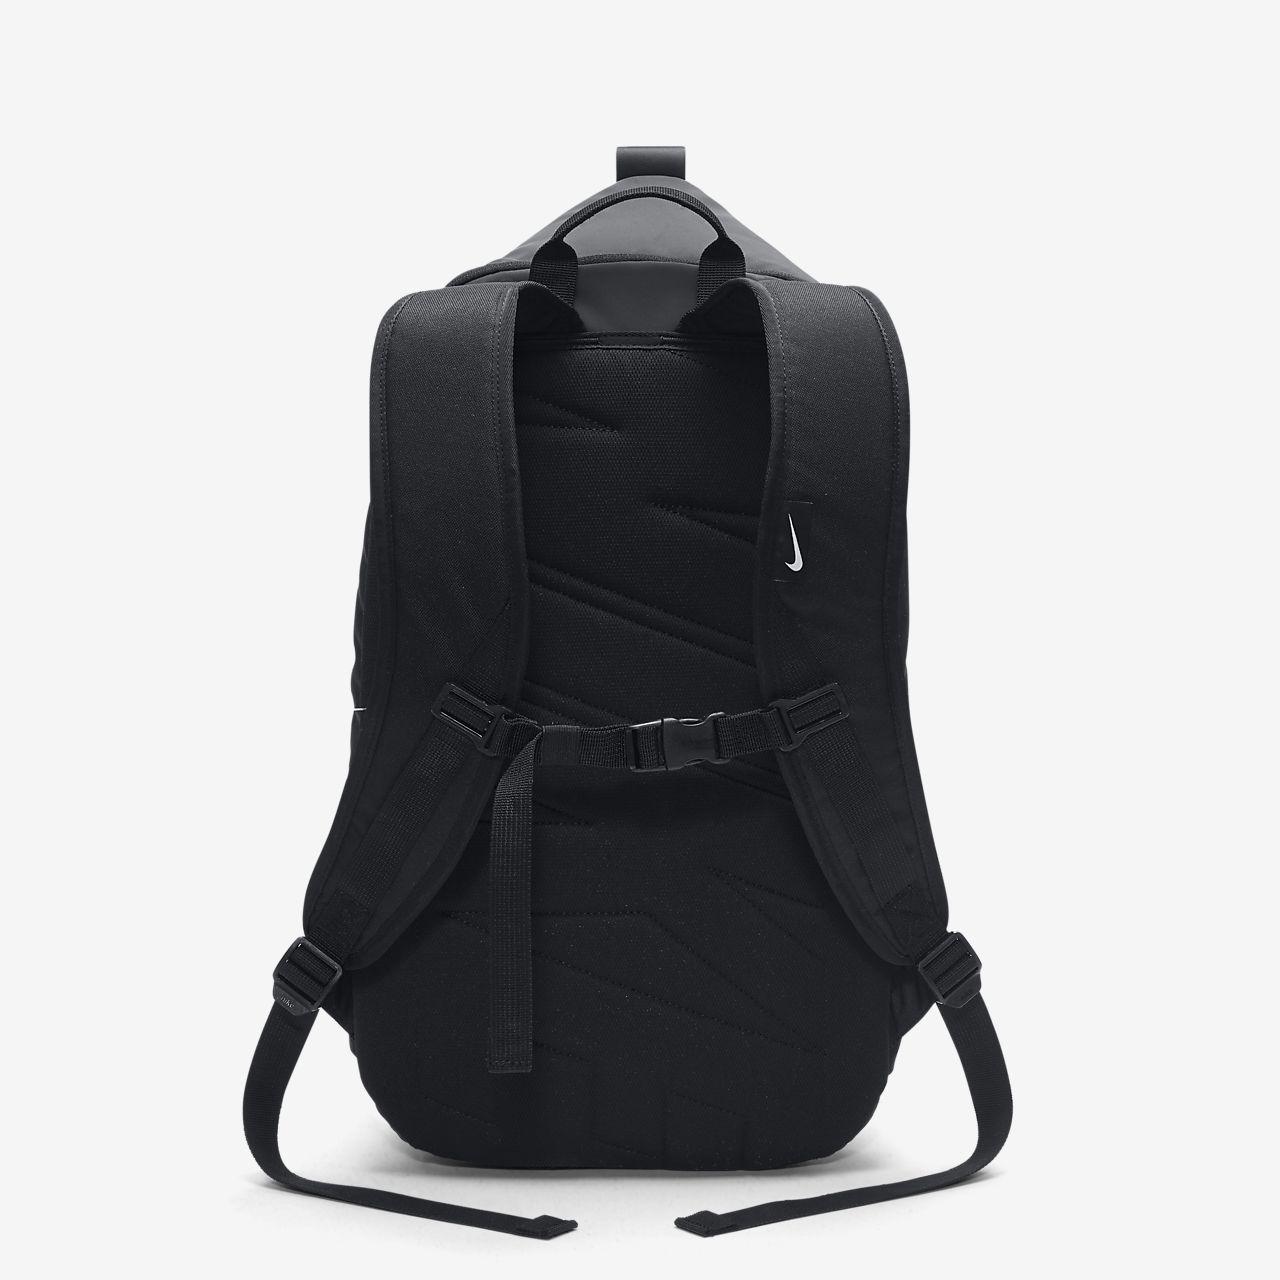 900bade59c65 Low Resolution Nike FB Centerline Football Backpack Nike FB Centerline  Football Backpack